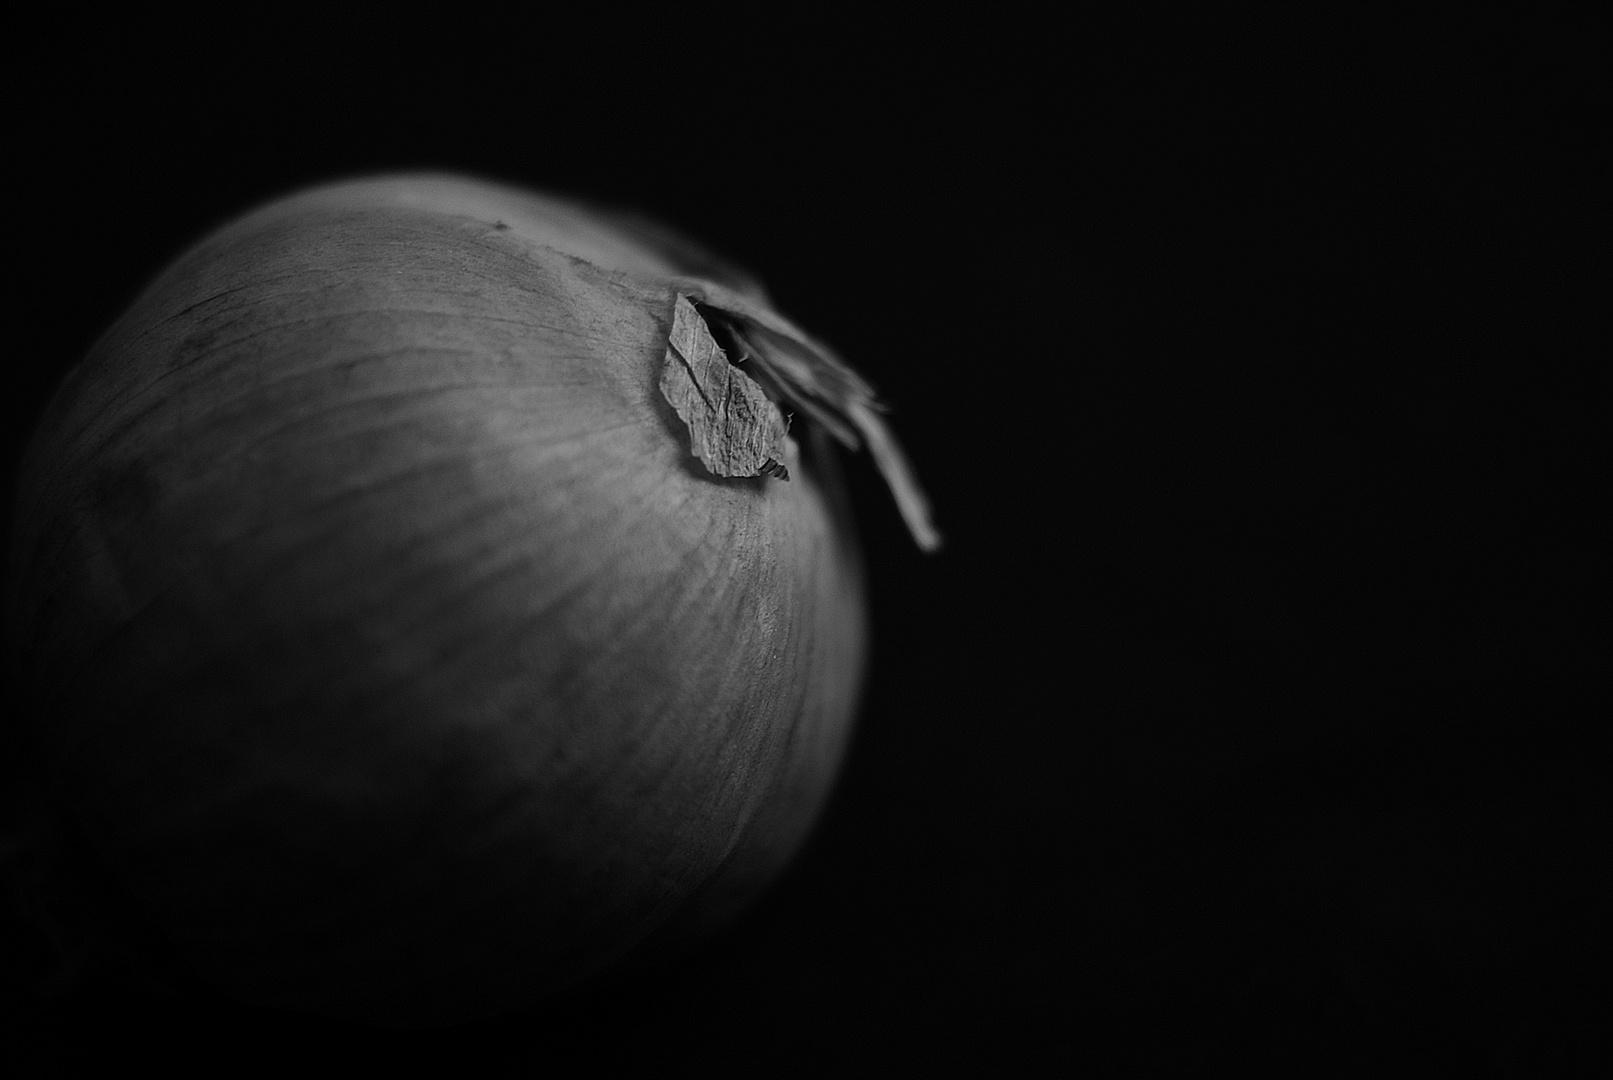 onion lowkey